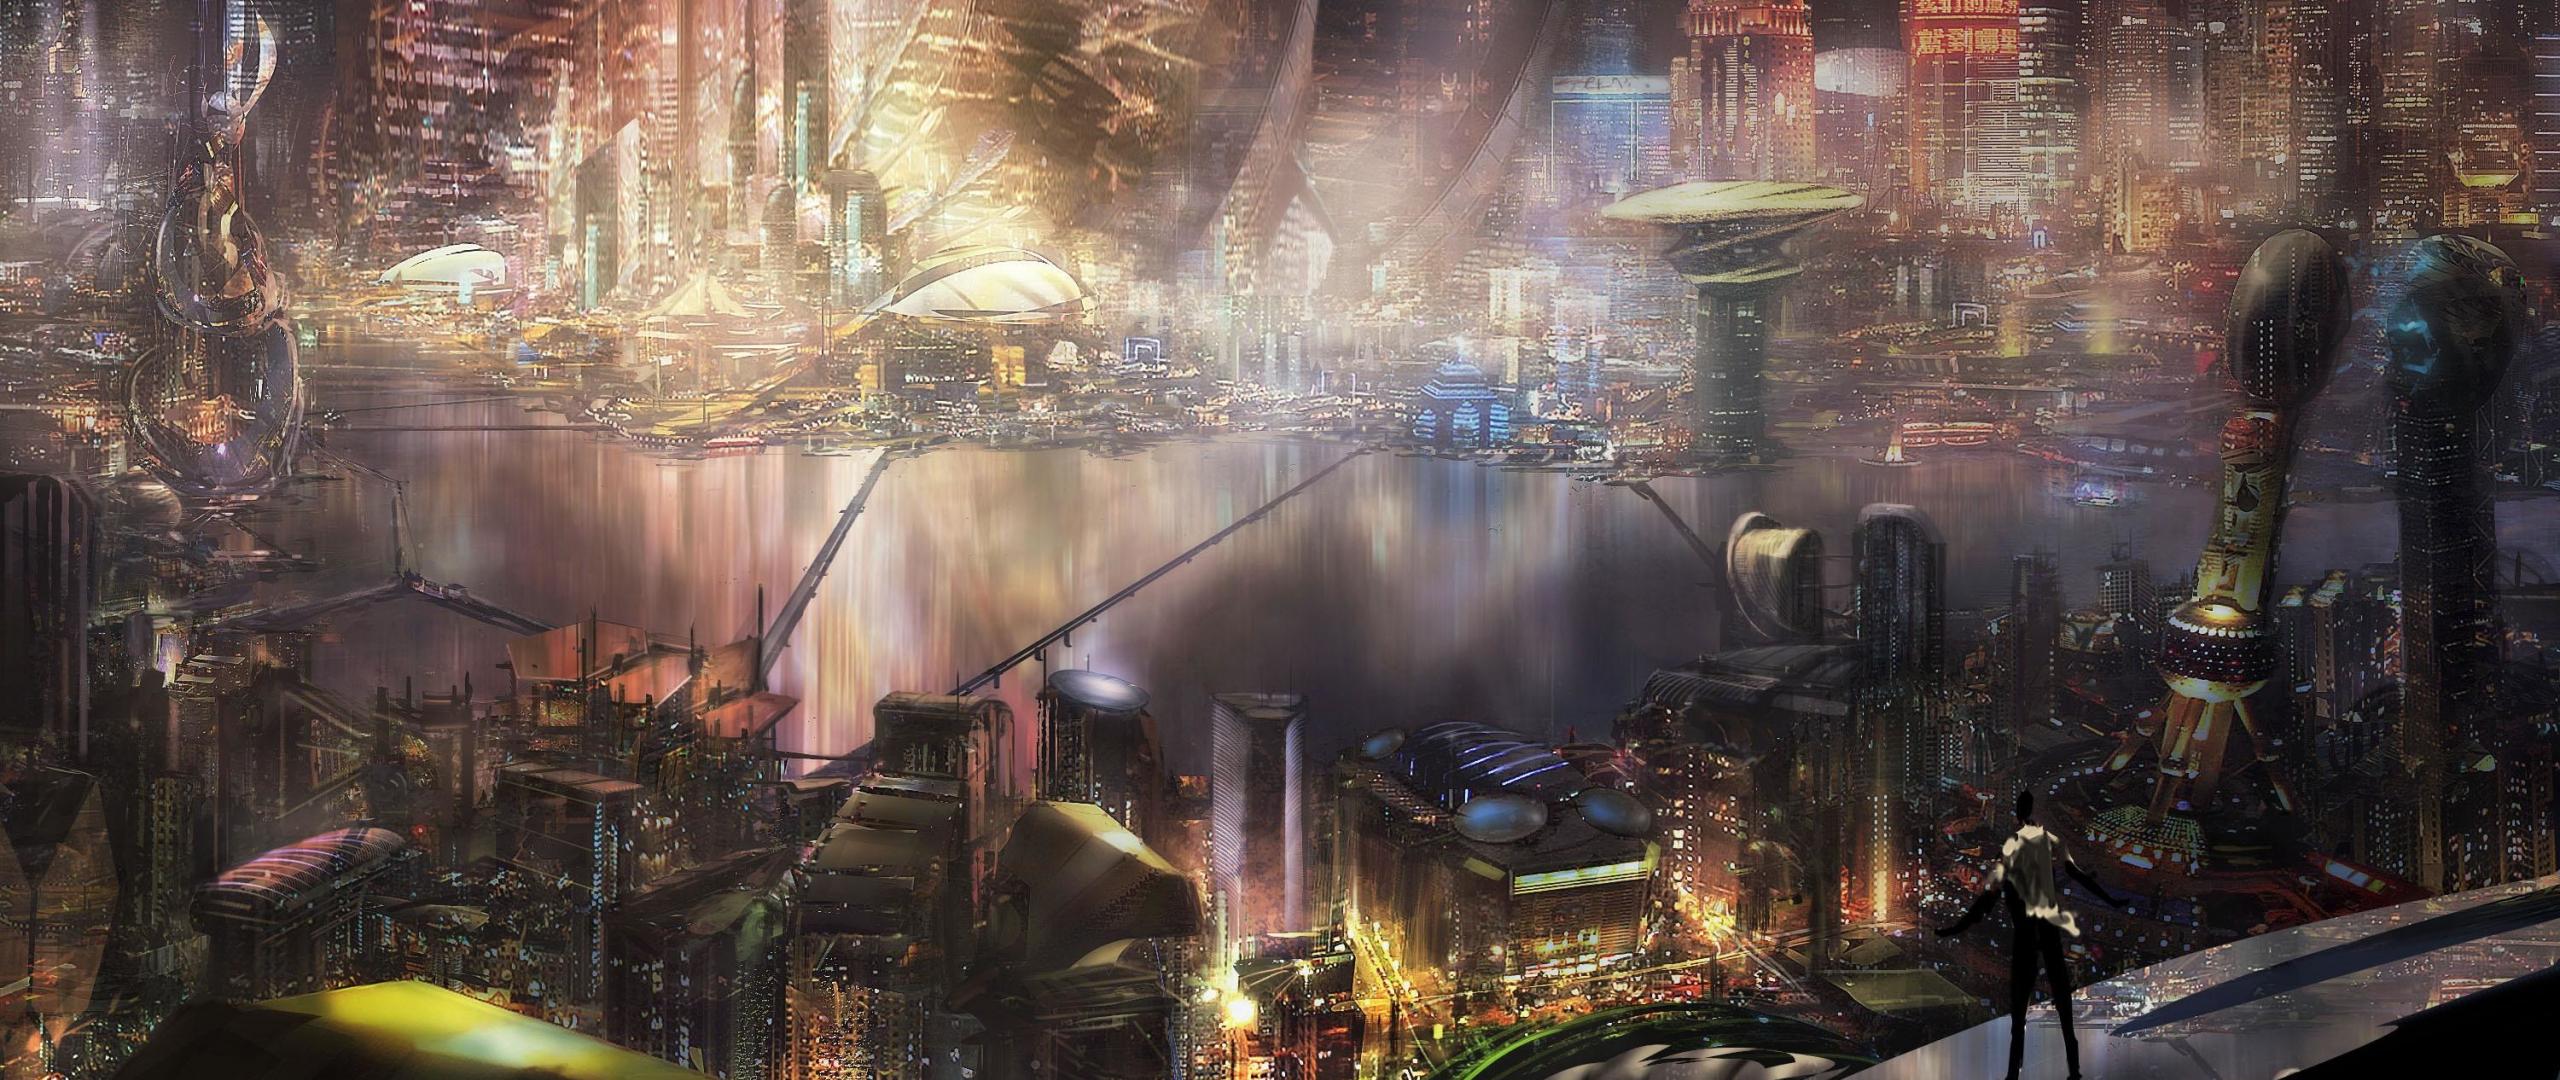 2560x1080 Final Fantasy Xv Artwork 2560x1080 Resolution Hd: Download 2560x1080 Wallpaper Cyberpunk, City, Cityscape